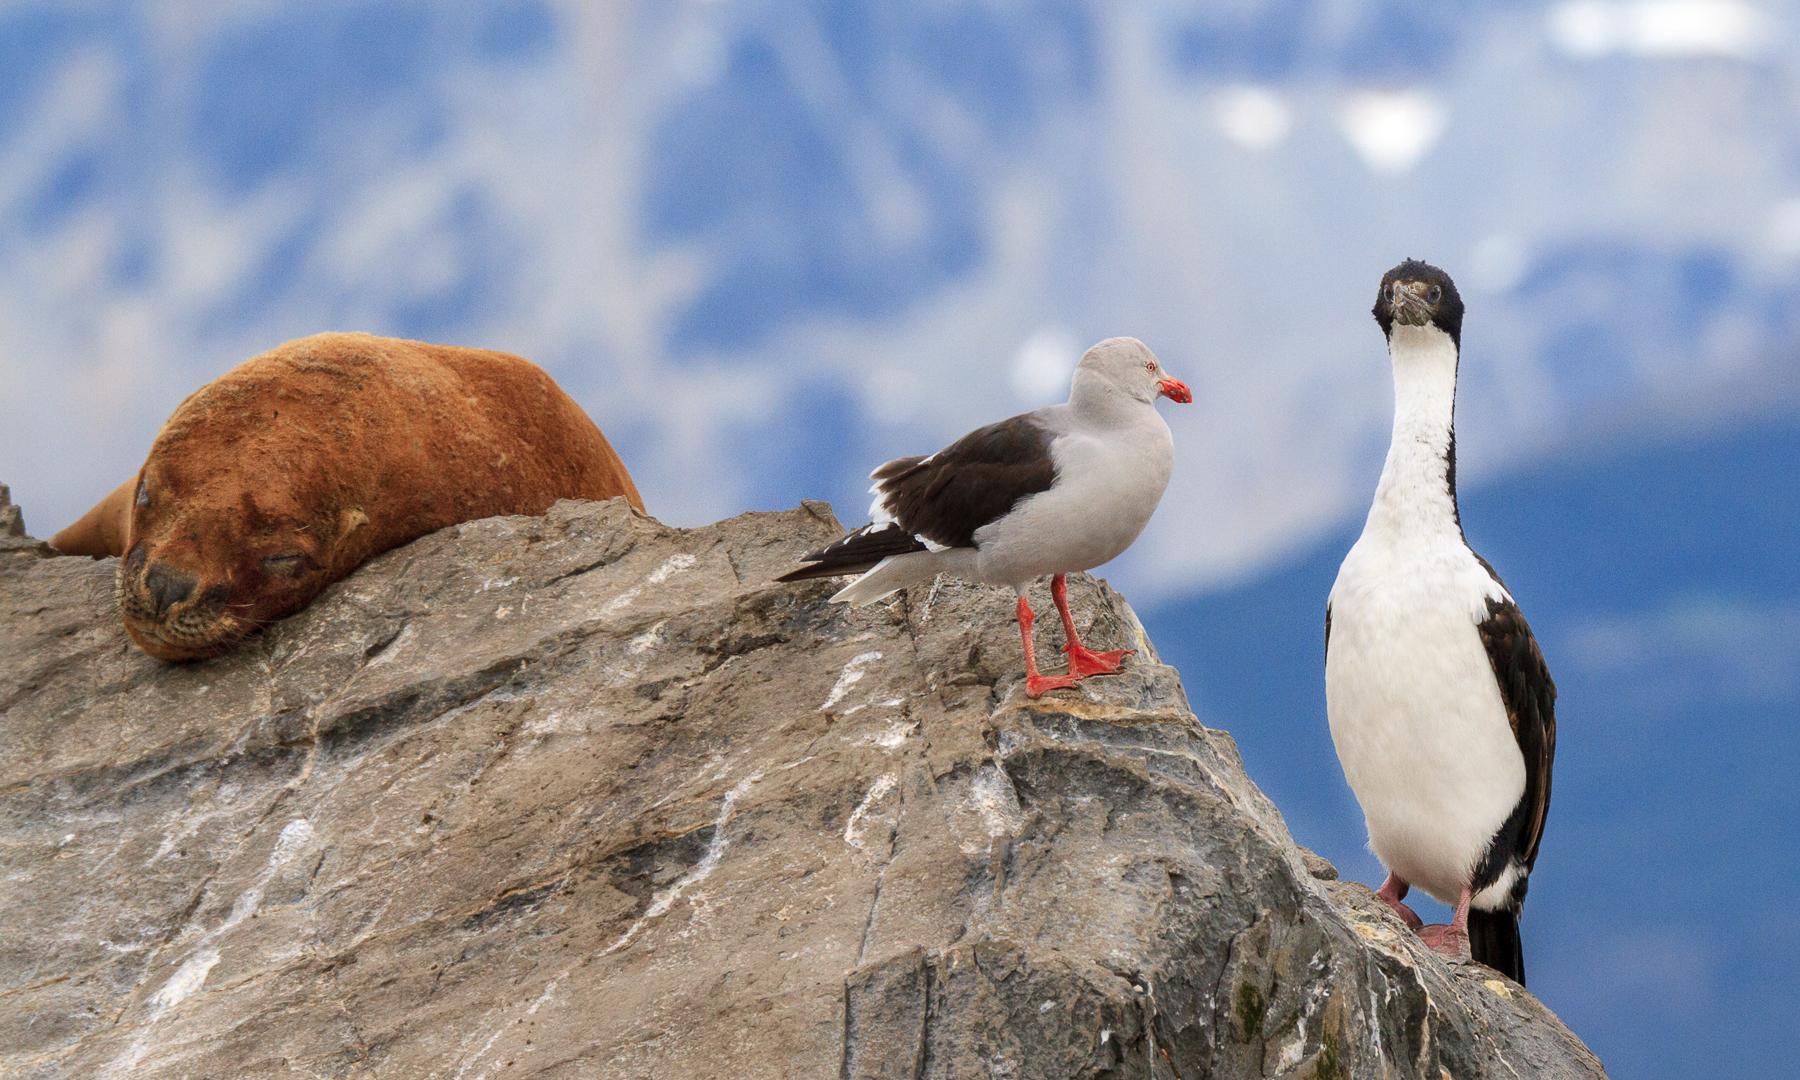 Imperial Shag (Cormorant), Kelp Gull, Seal,